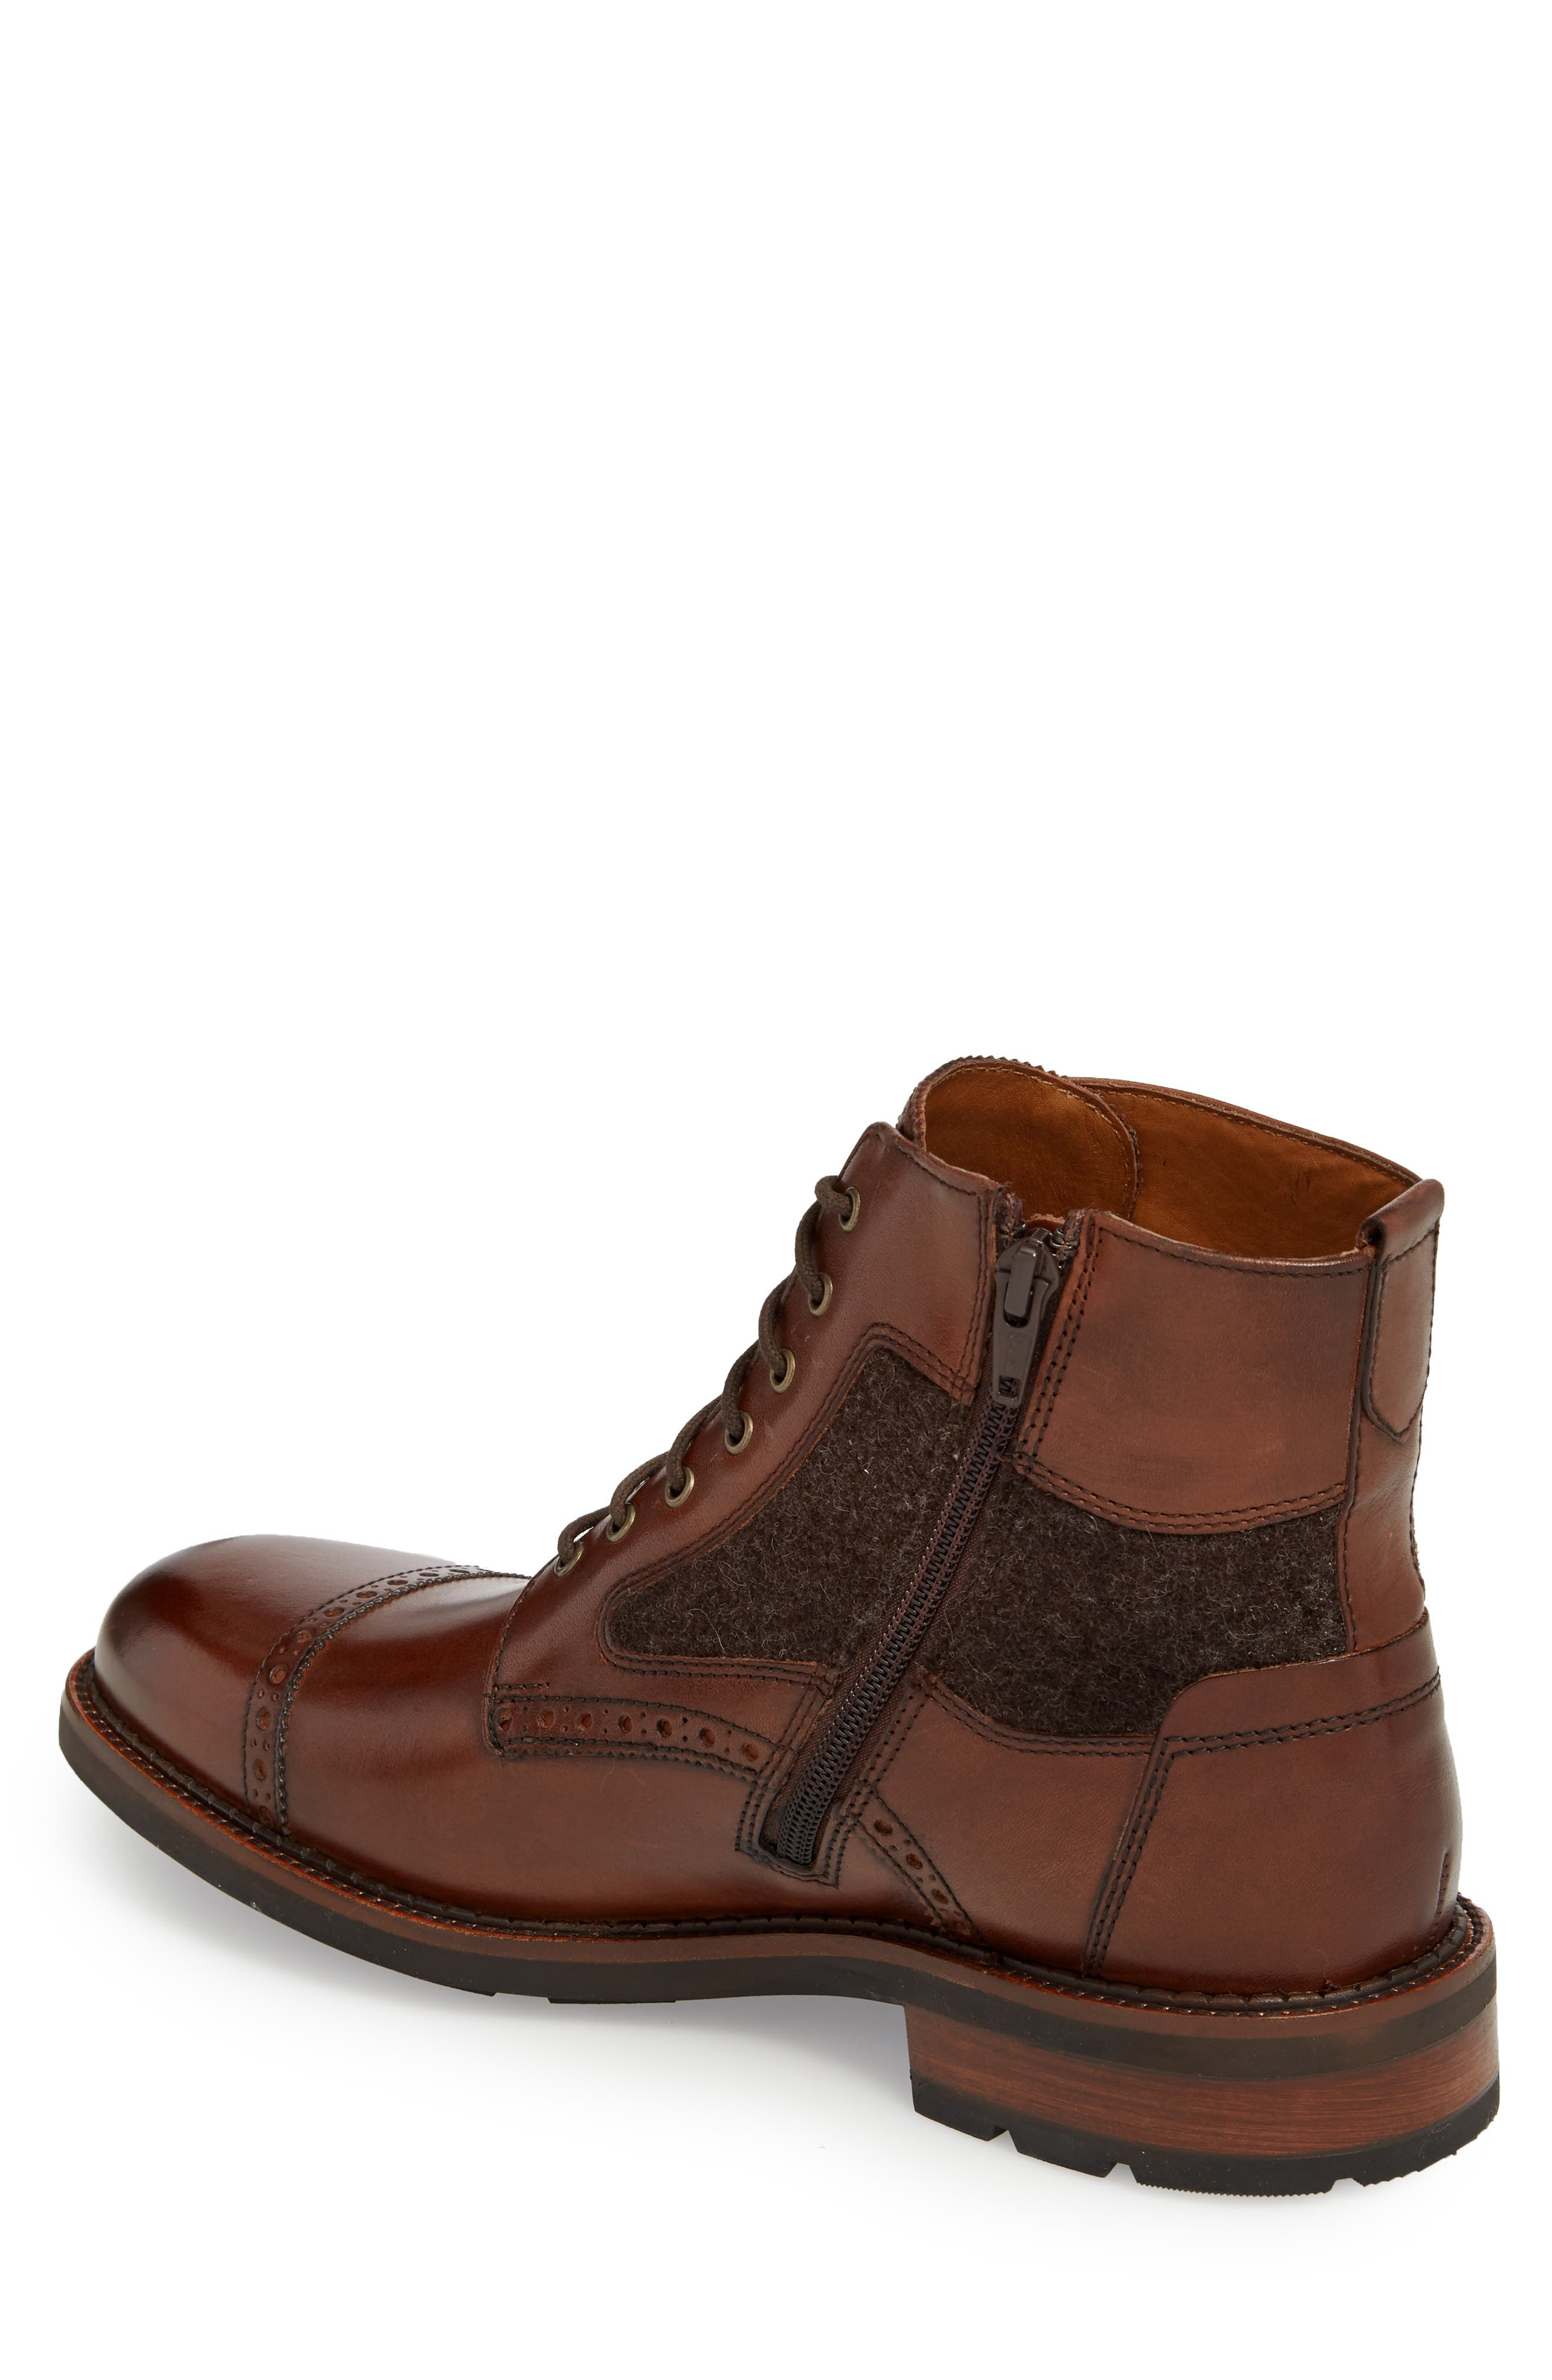 Fullerton Zip Boot,                             Alternate thumbnail 2, color,                             MAHOGANY